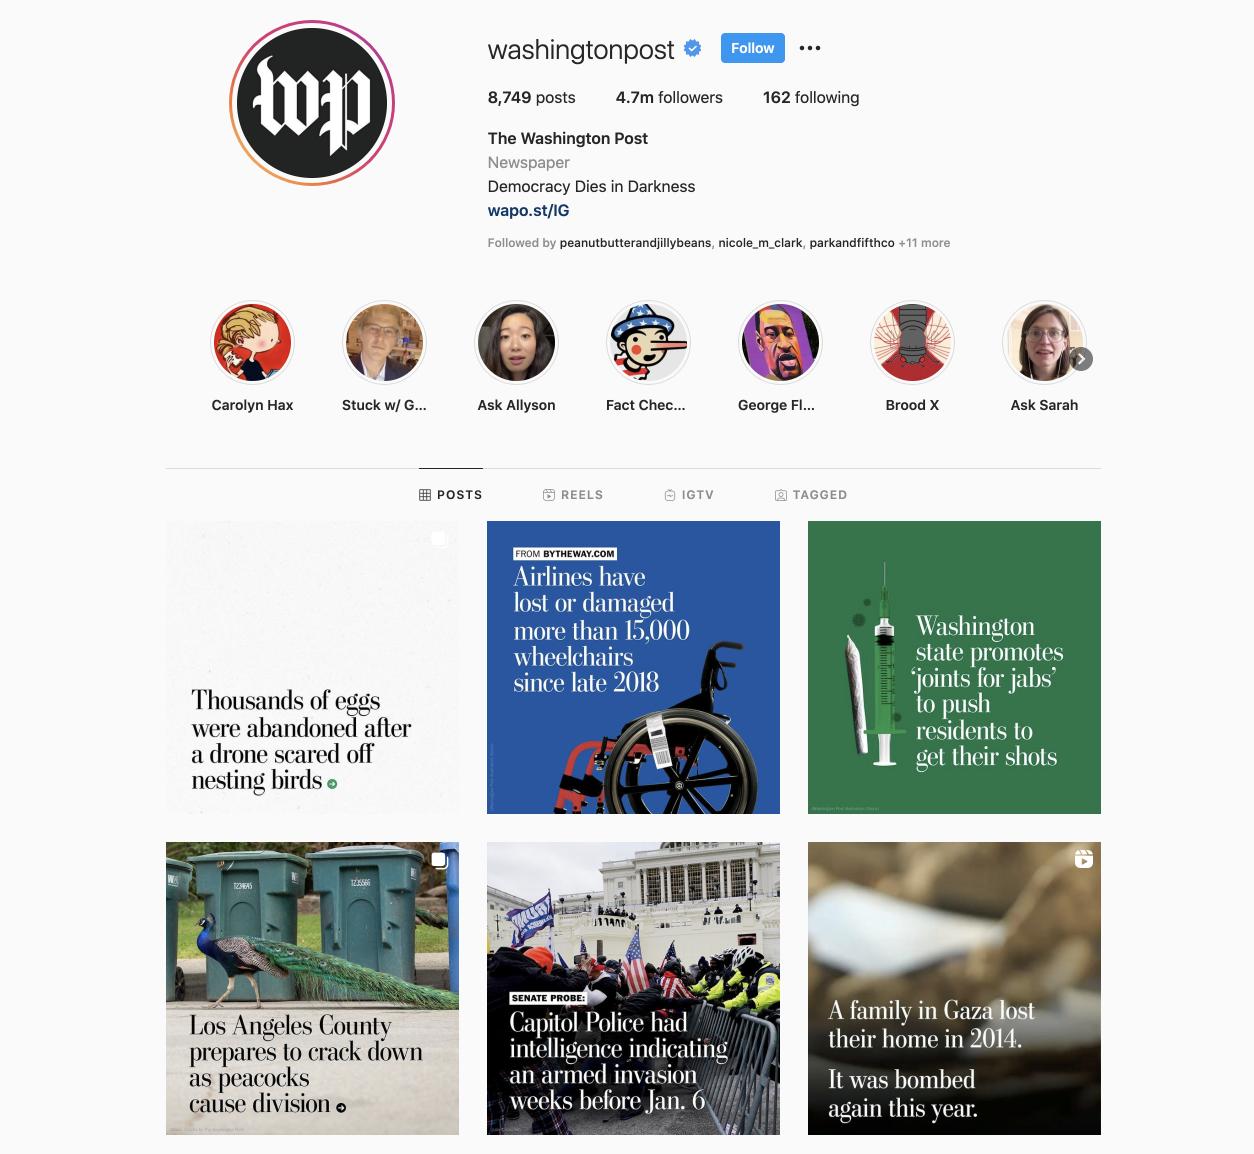 Washingtonpost Instagram profile.